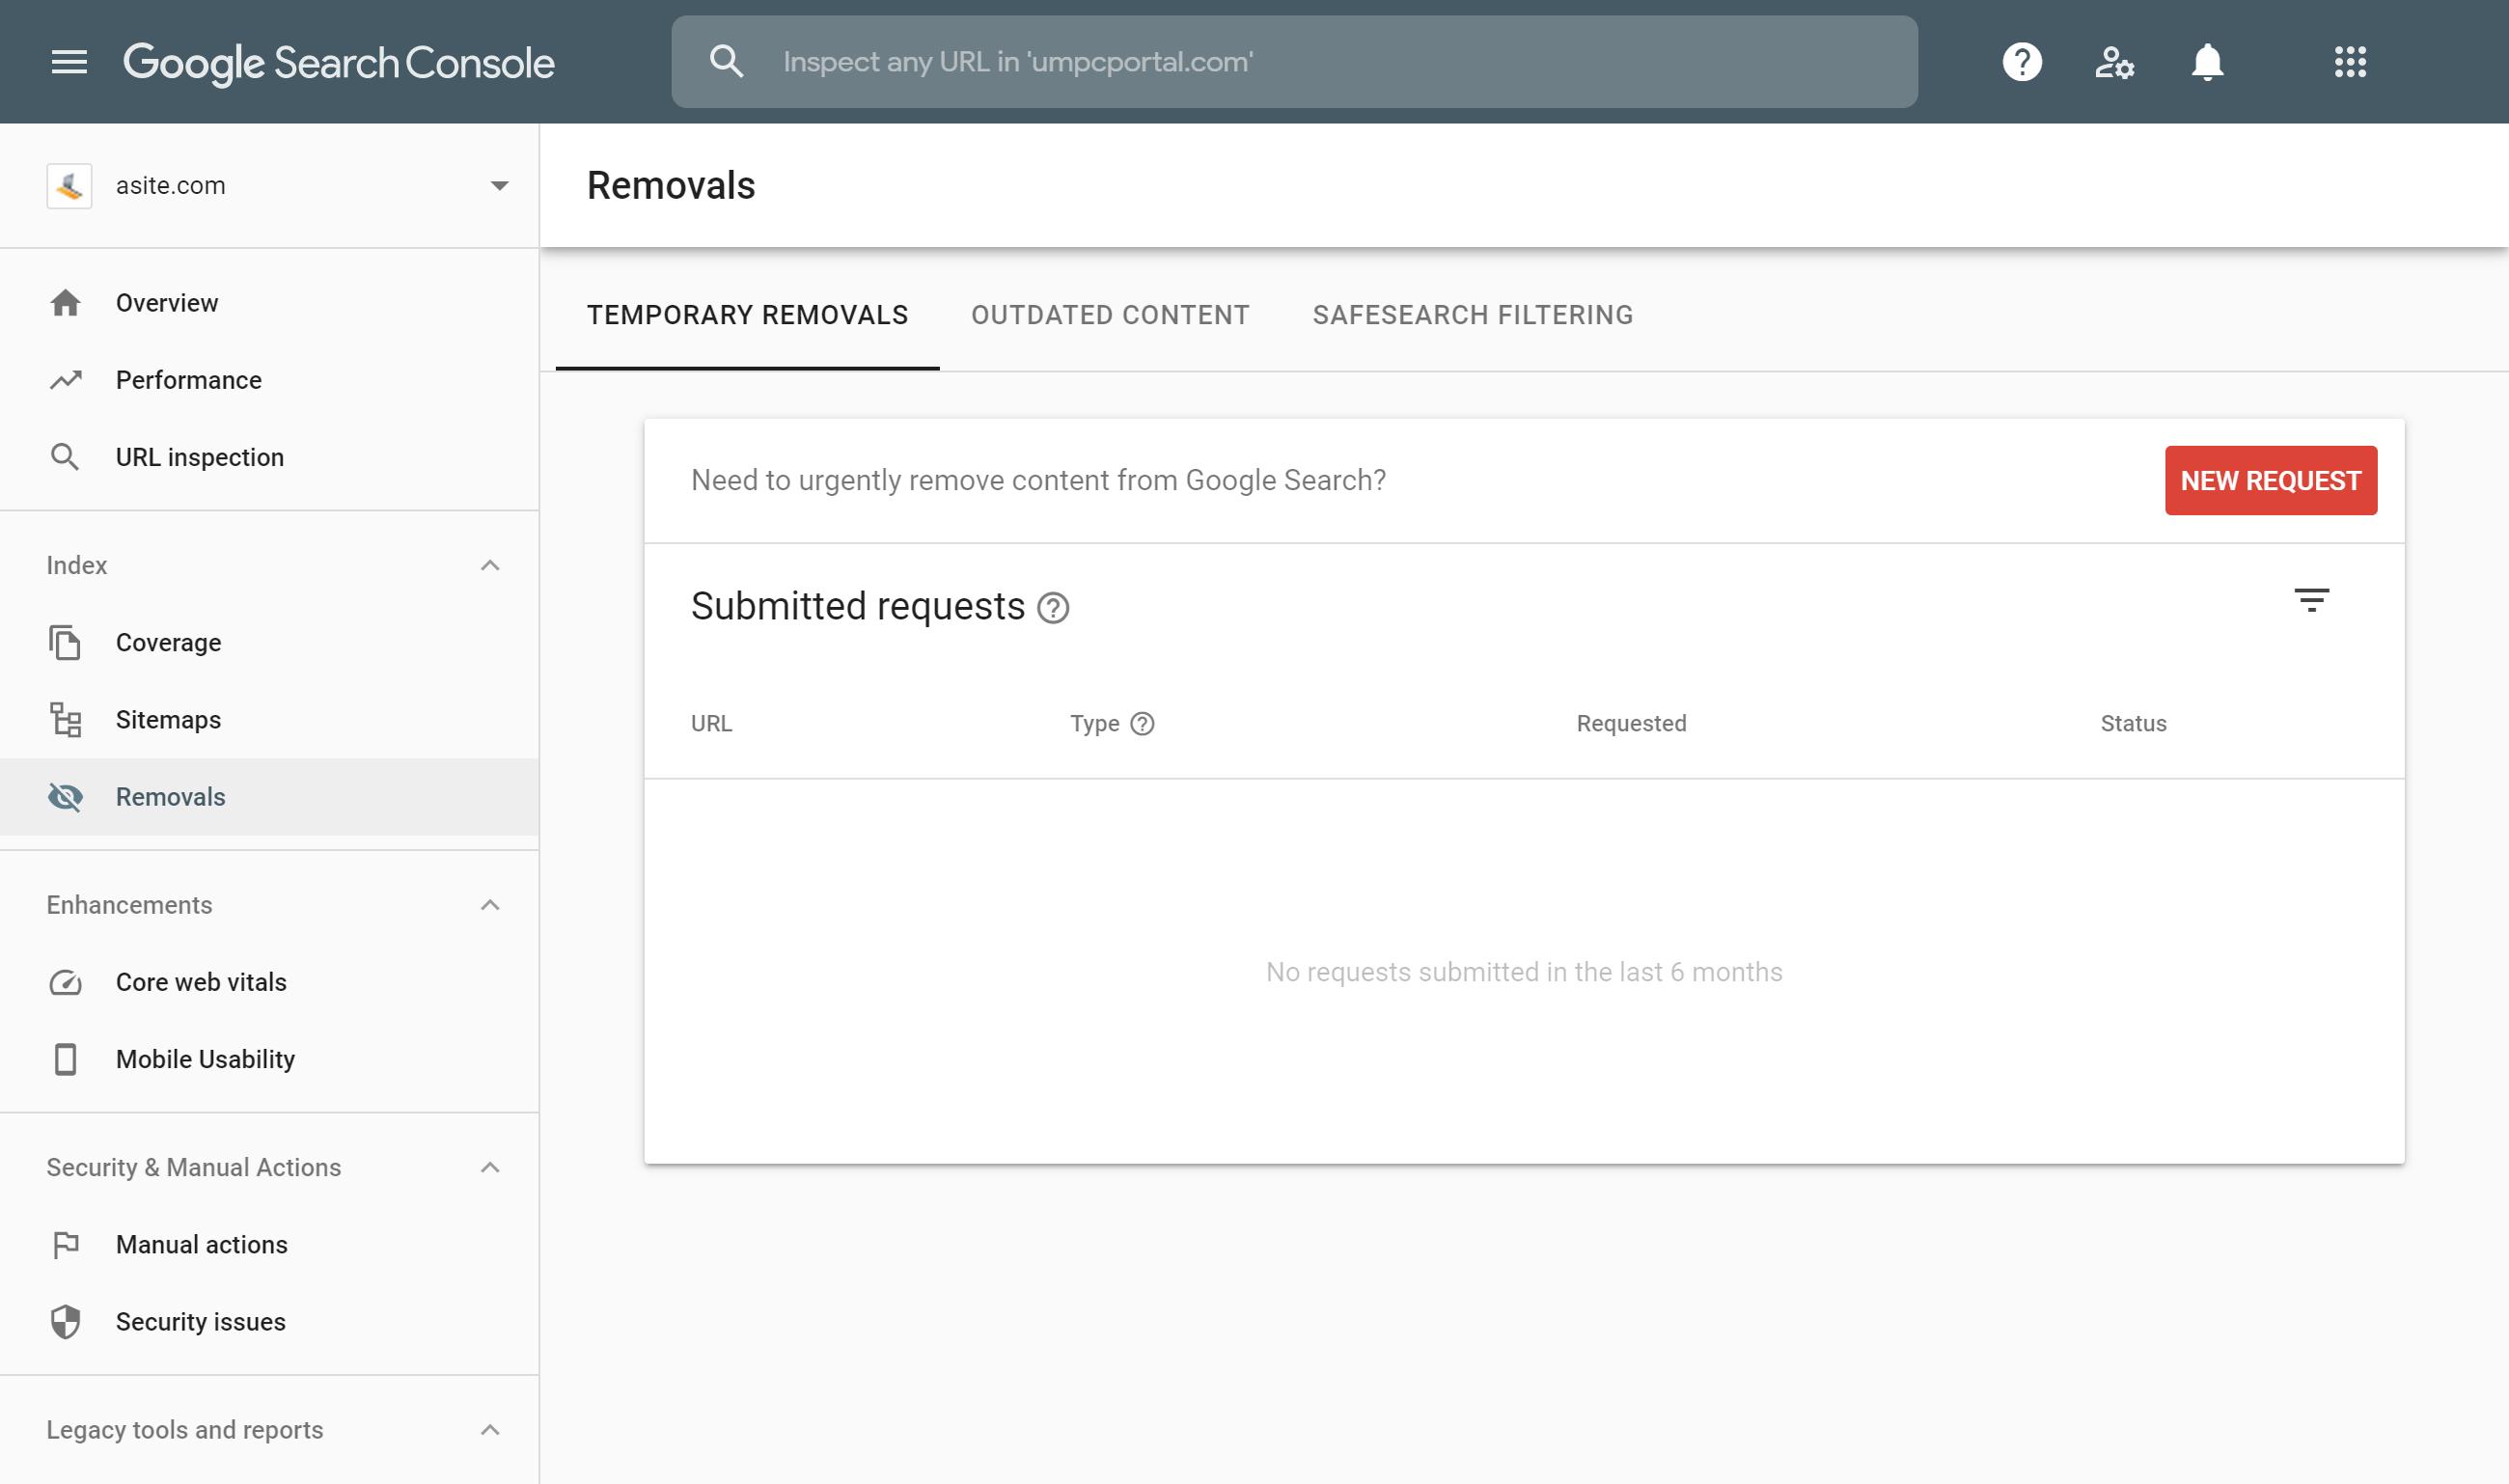 Google Search Console image